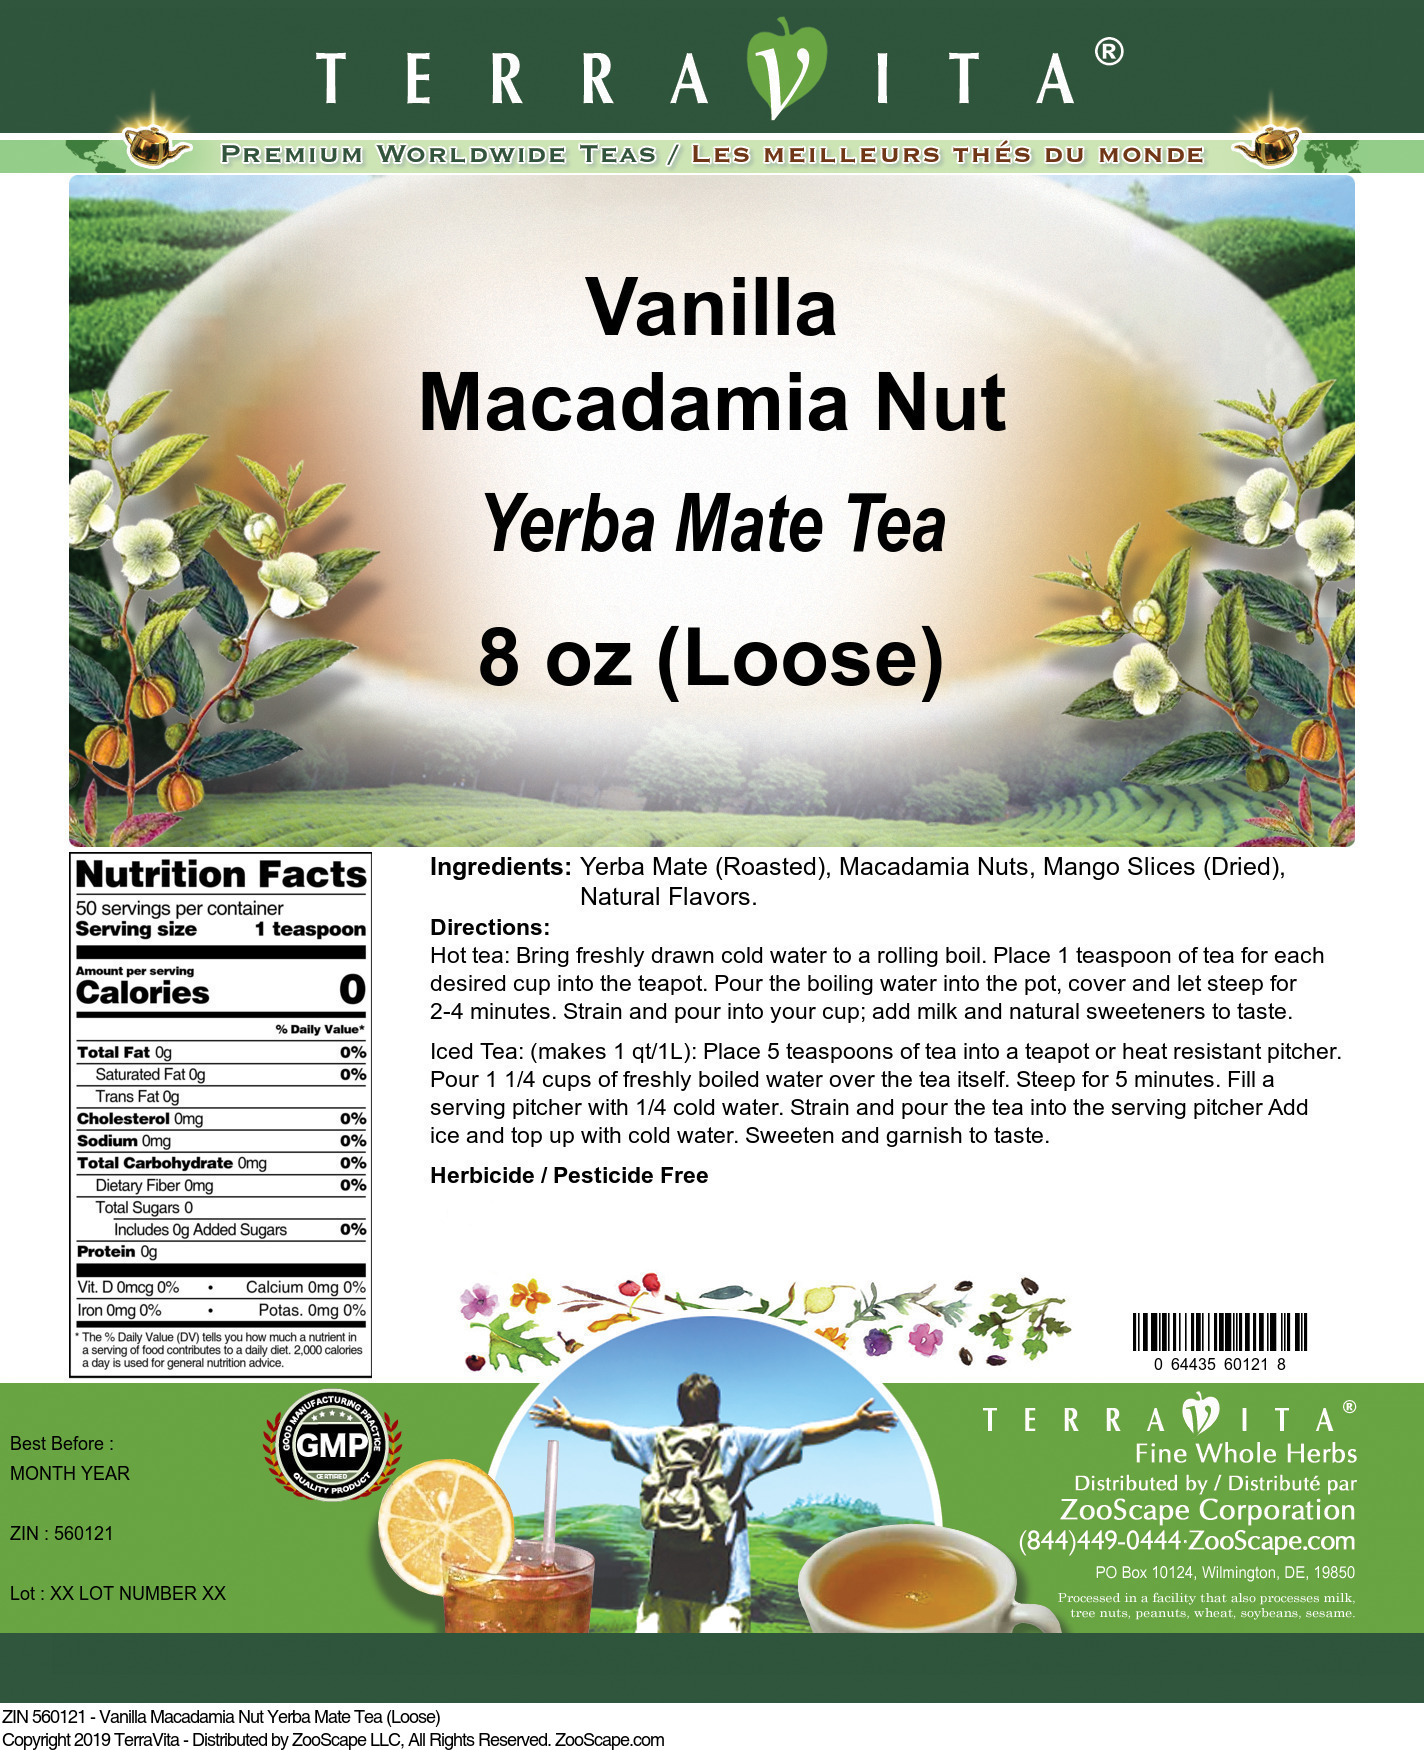 Vanilla Macadamia Nut Yerba Mate